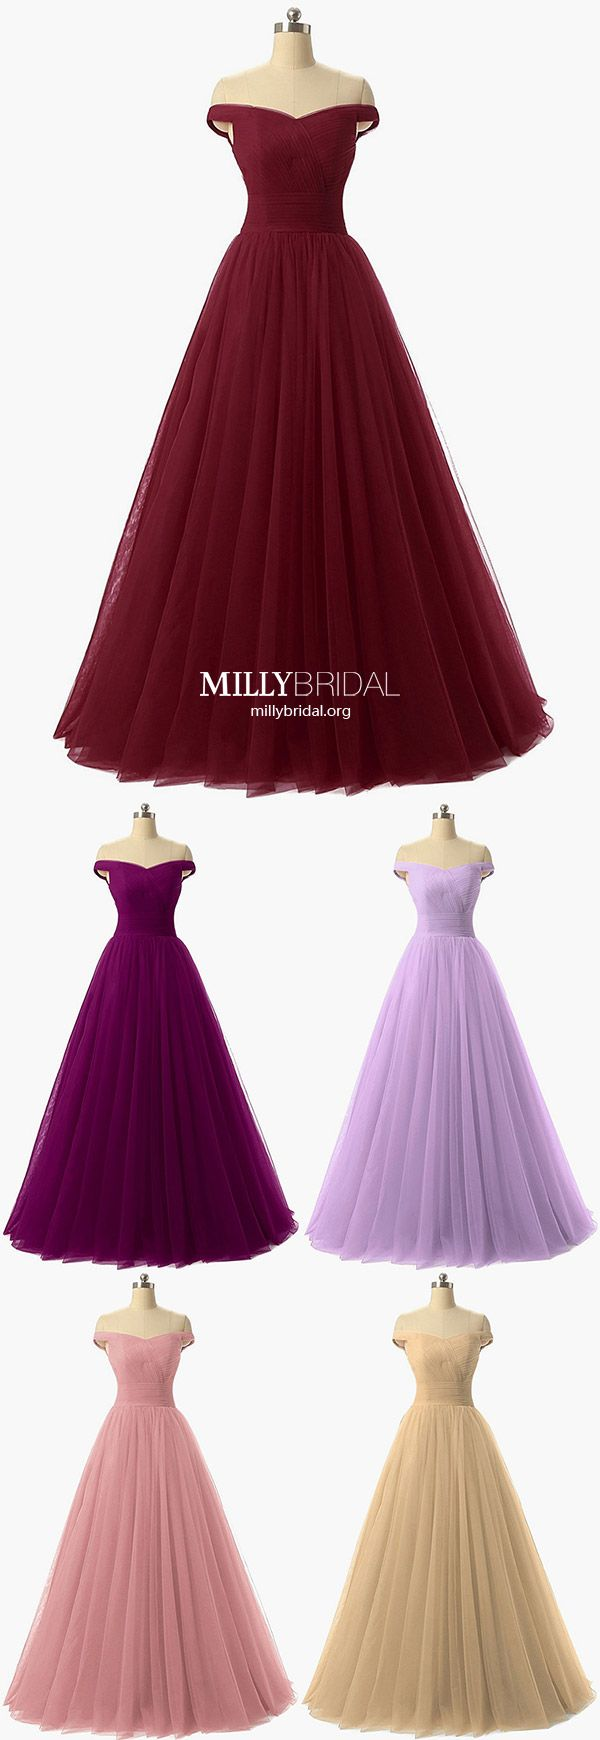 Burgundy prom dresses vintagemaroon prom dresses longprincess